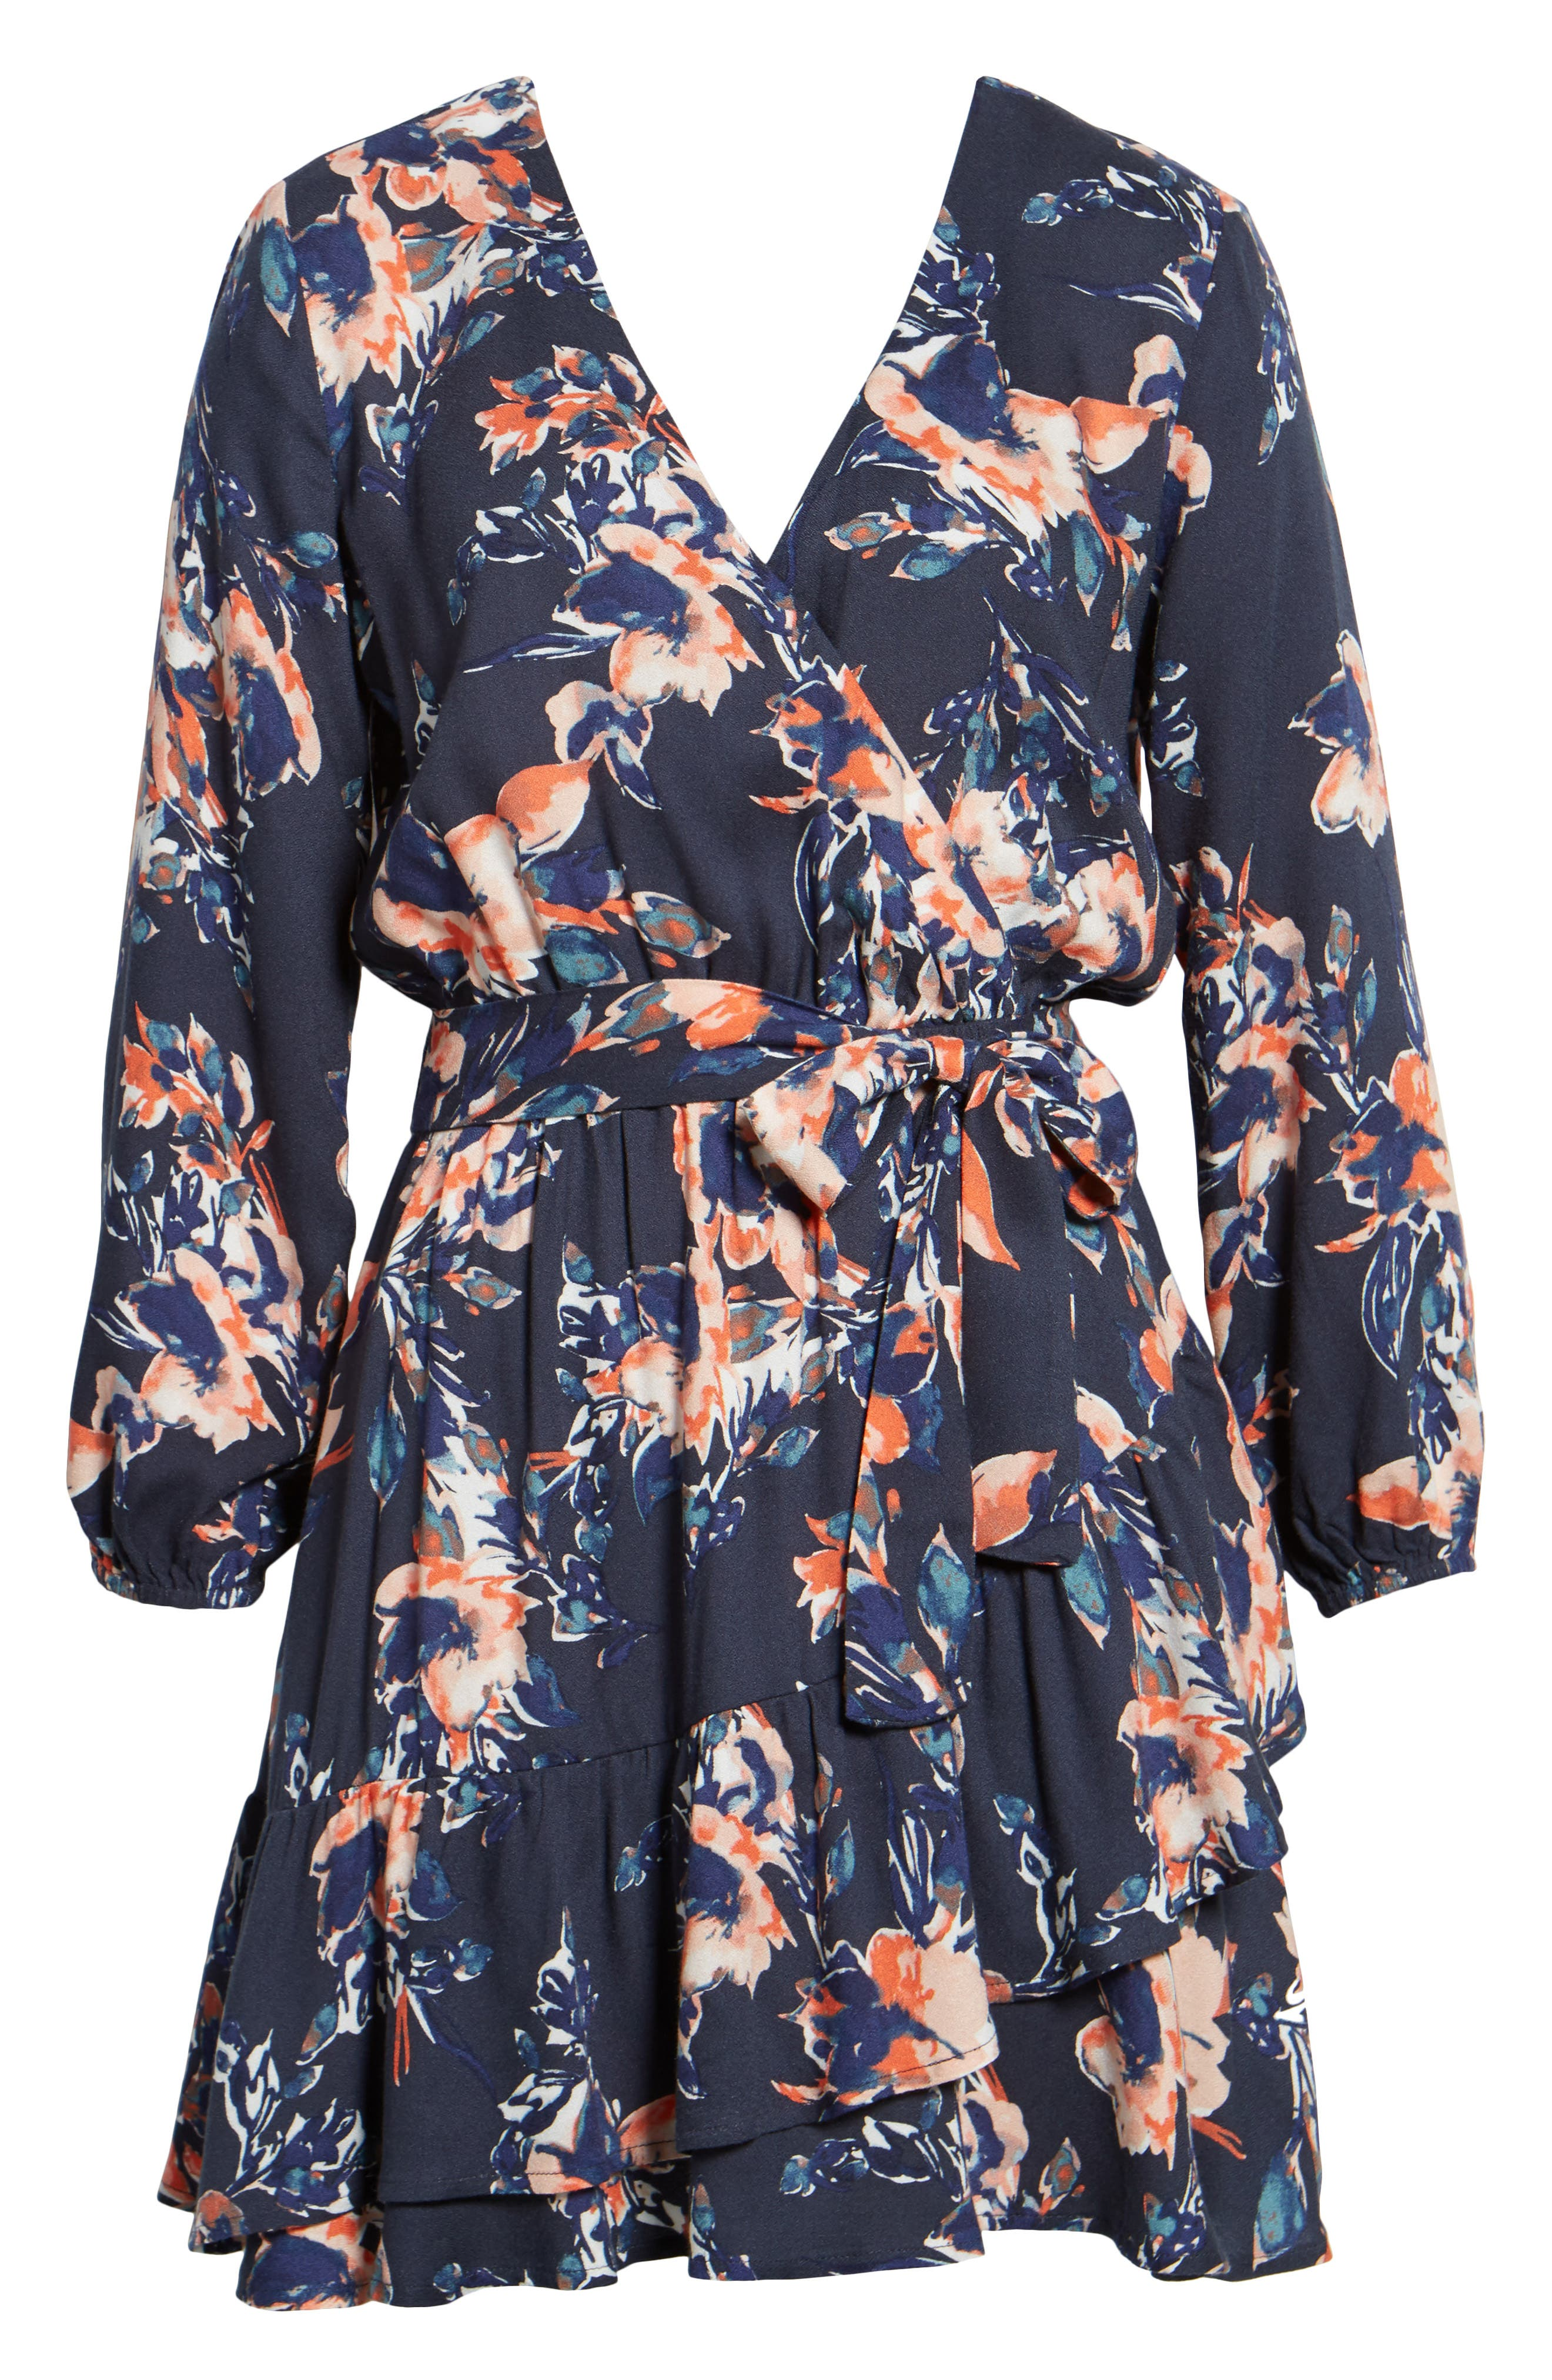 Painted Floral Wrap Dress,                             Alternate thumbnail 6, color,                             Navy